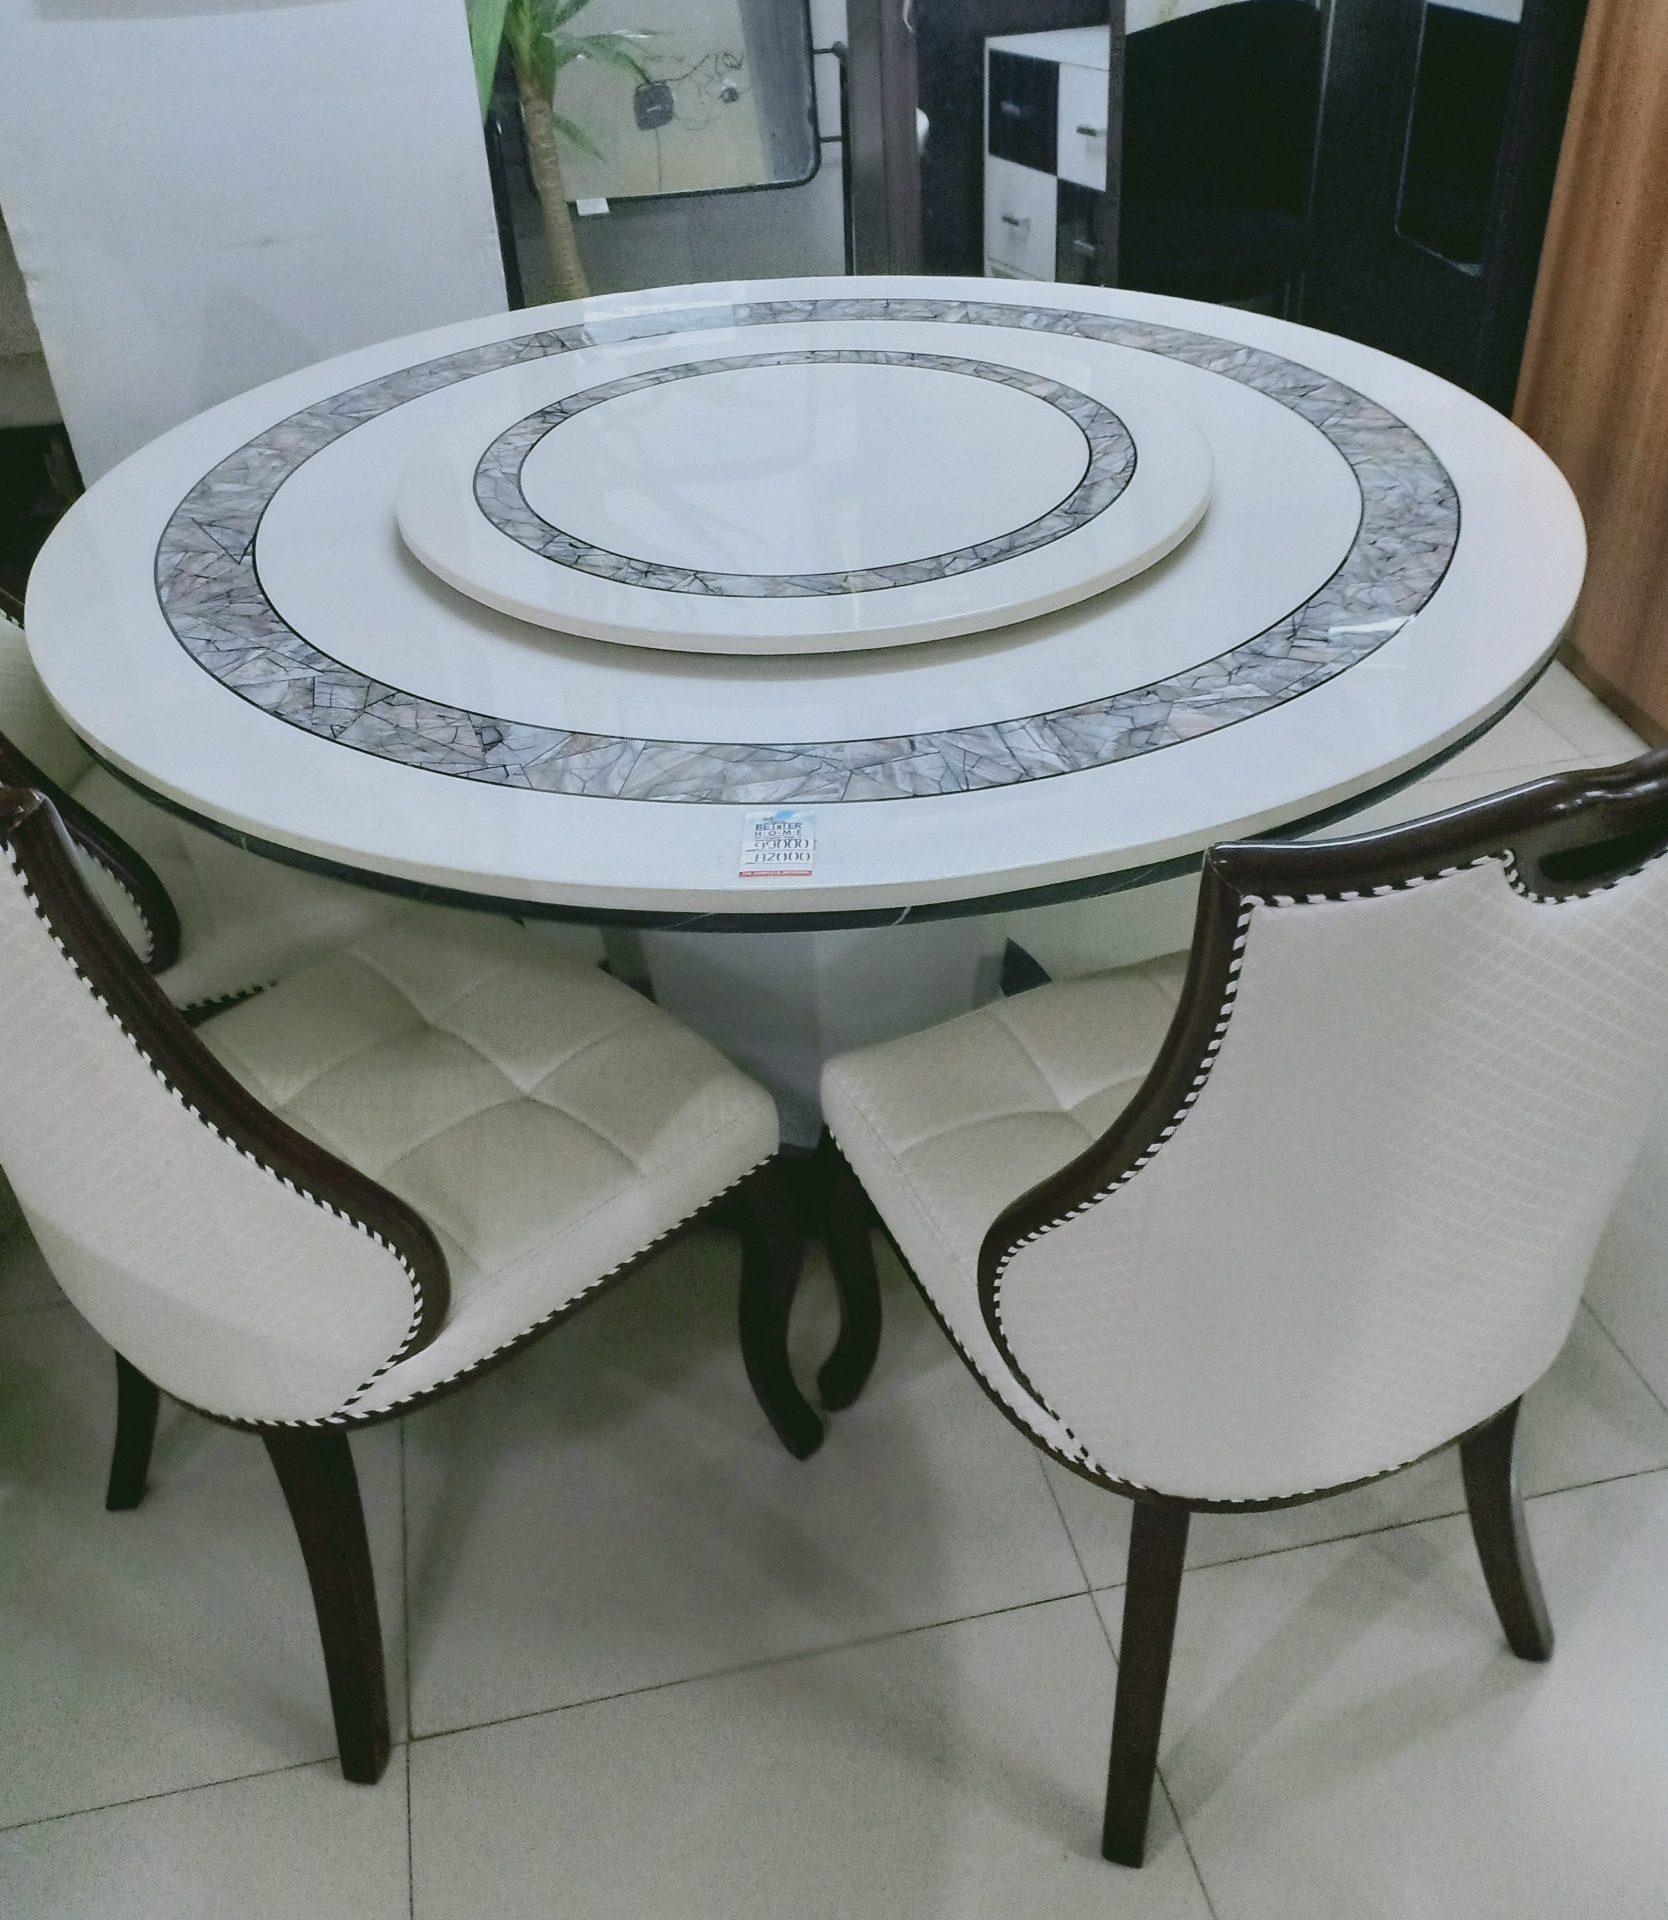 Yelta Dining Set Betterhomeindia Round Marble Dining Set Ahmedabad Imported Marble Dining Set Ahmedabad